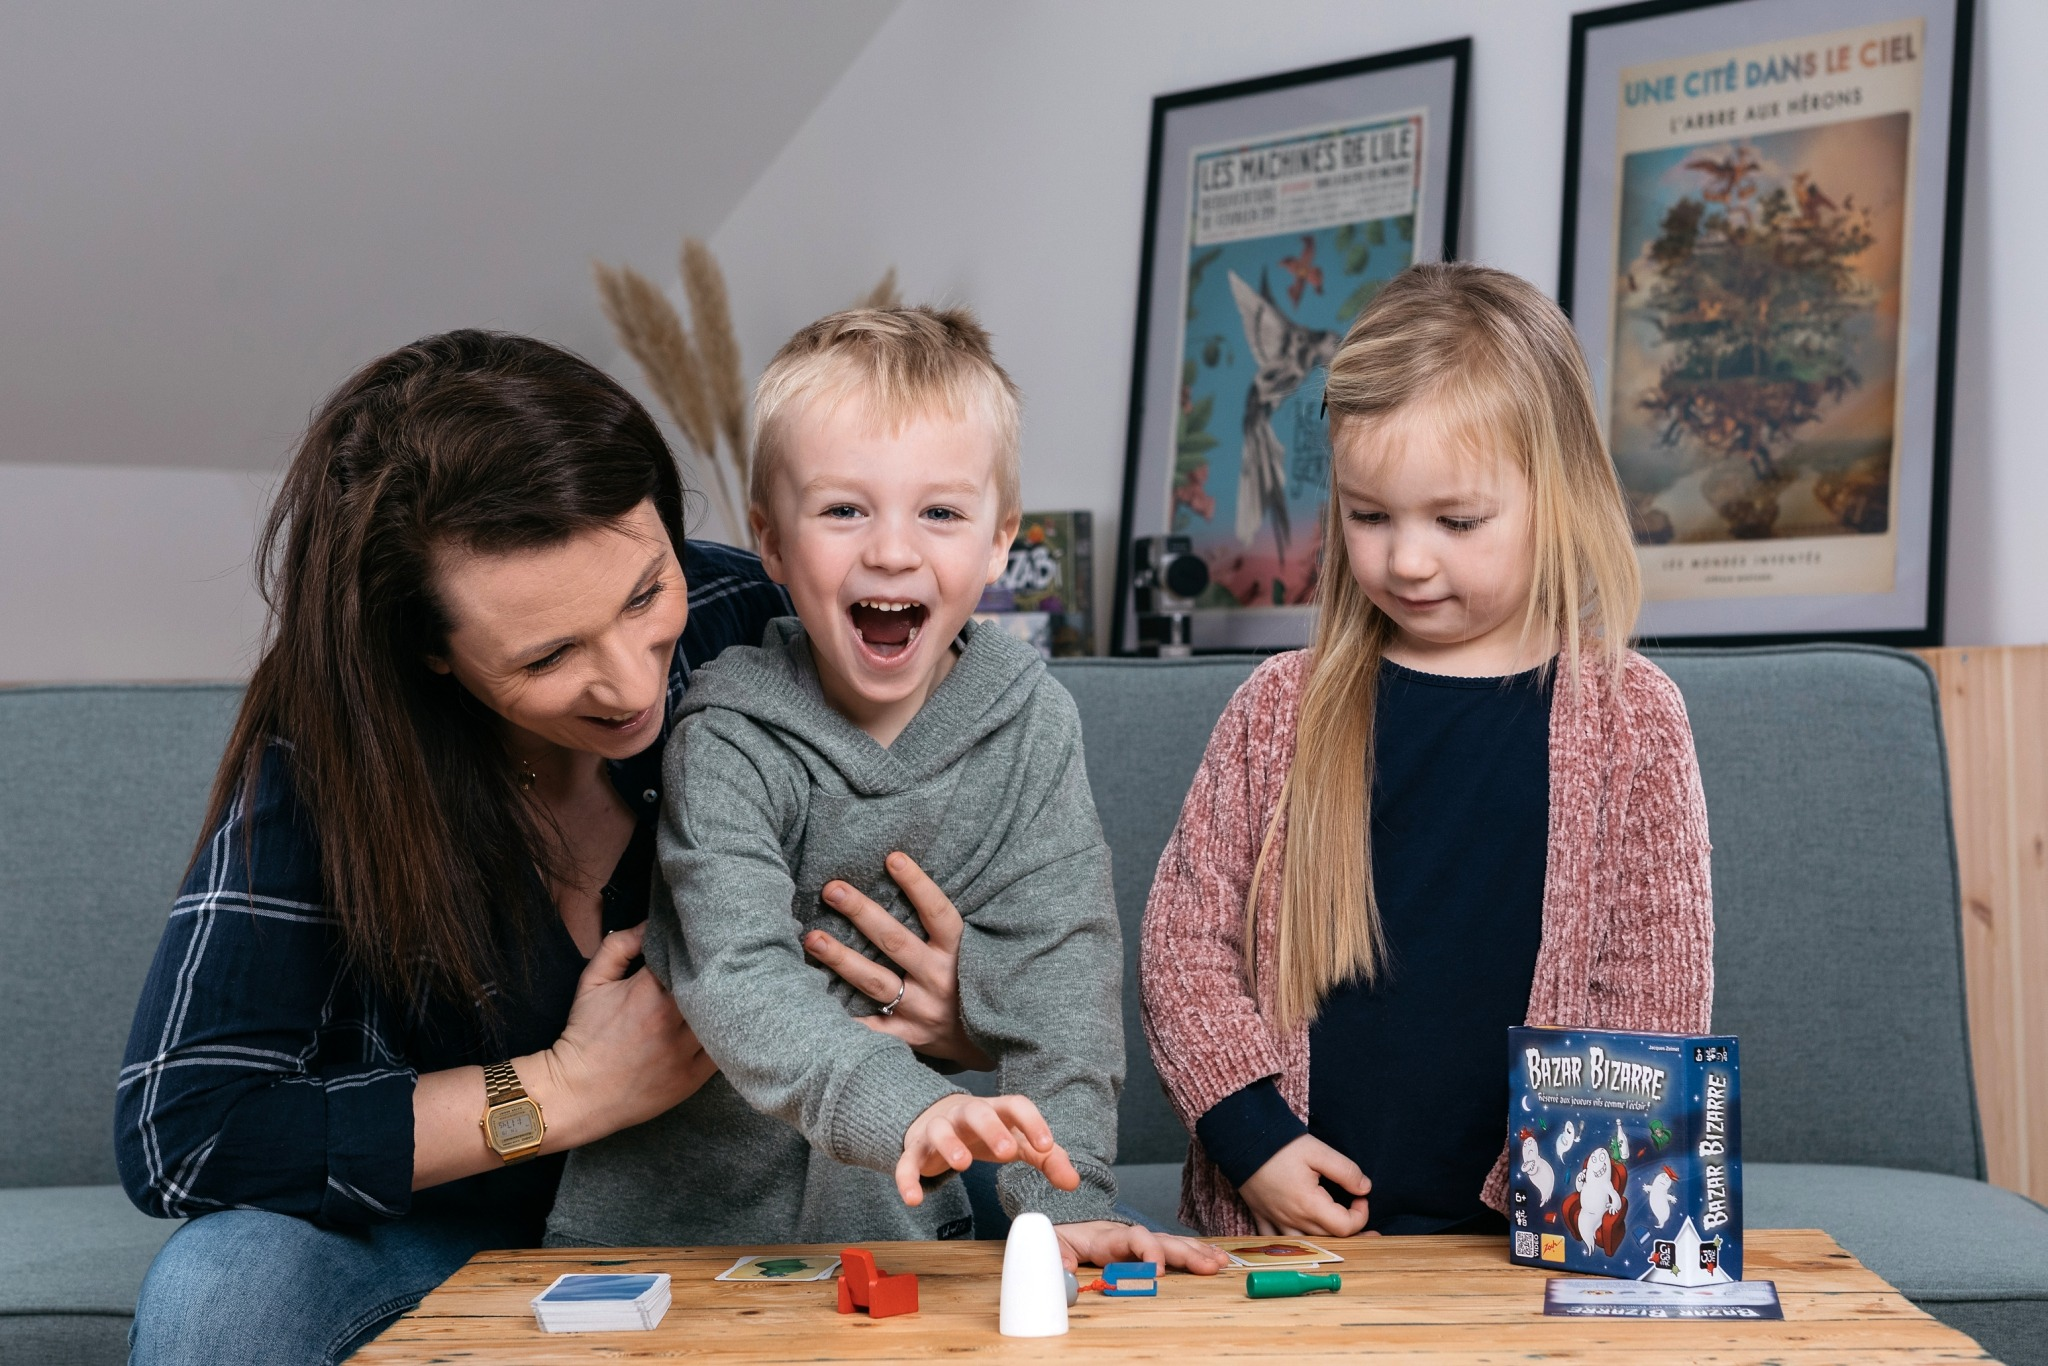 Bazar bizarre gigamic jeu de société famille